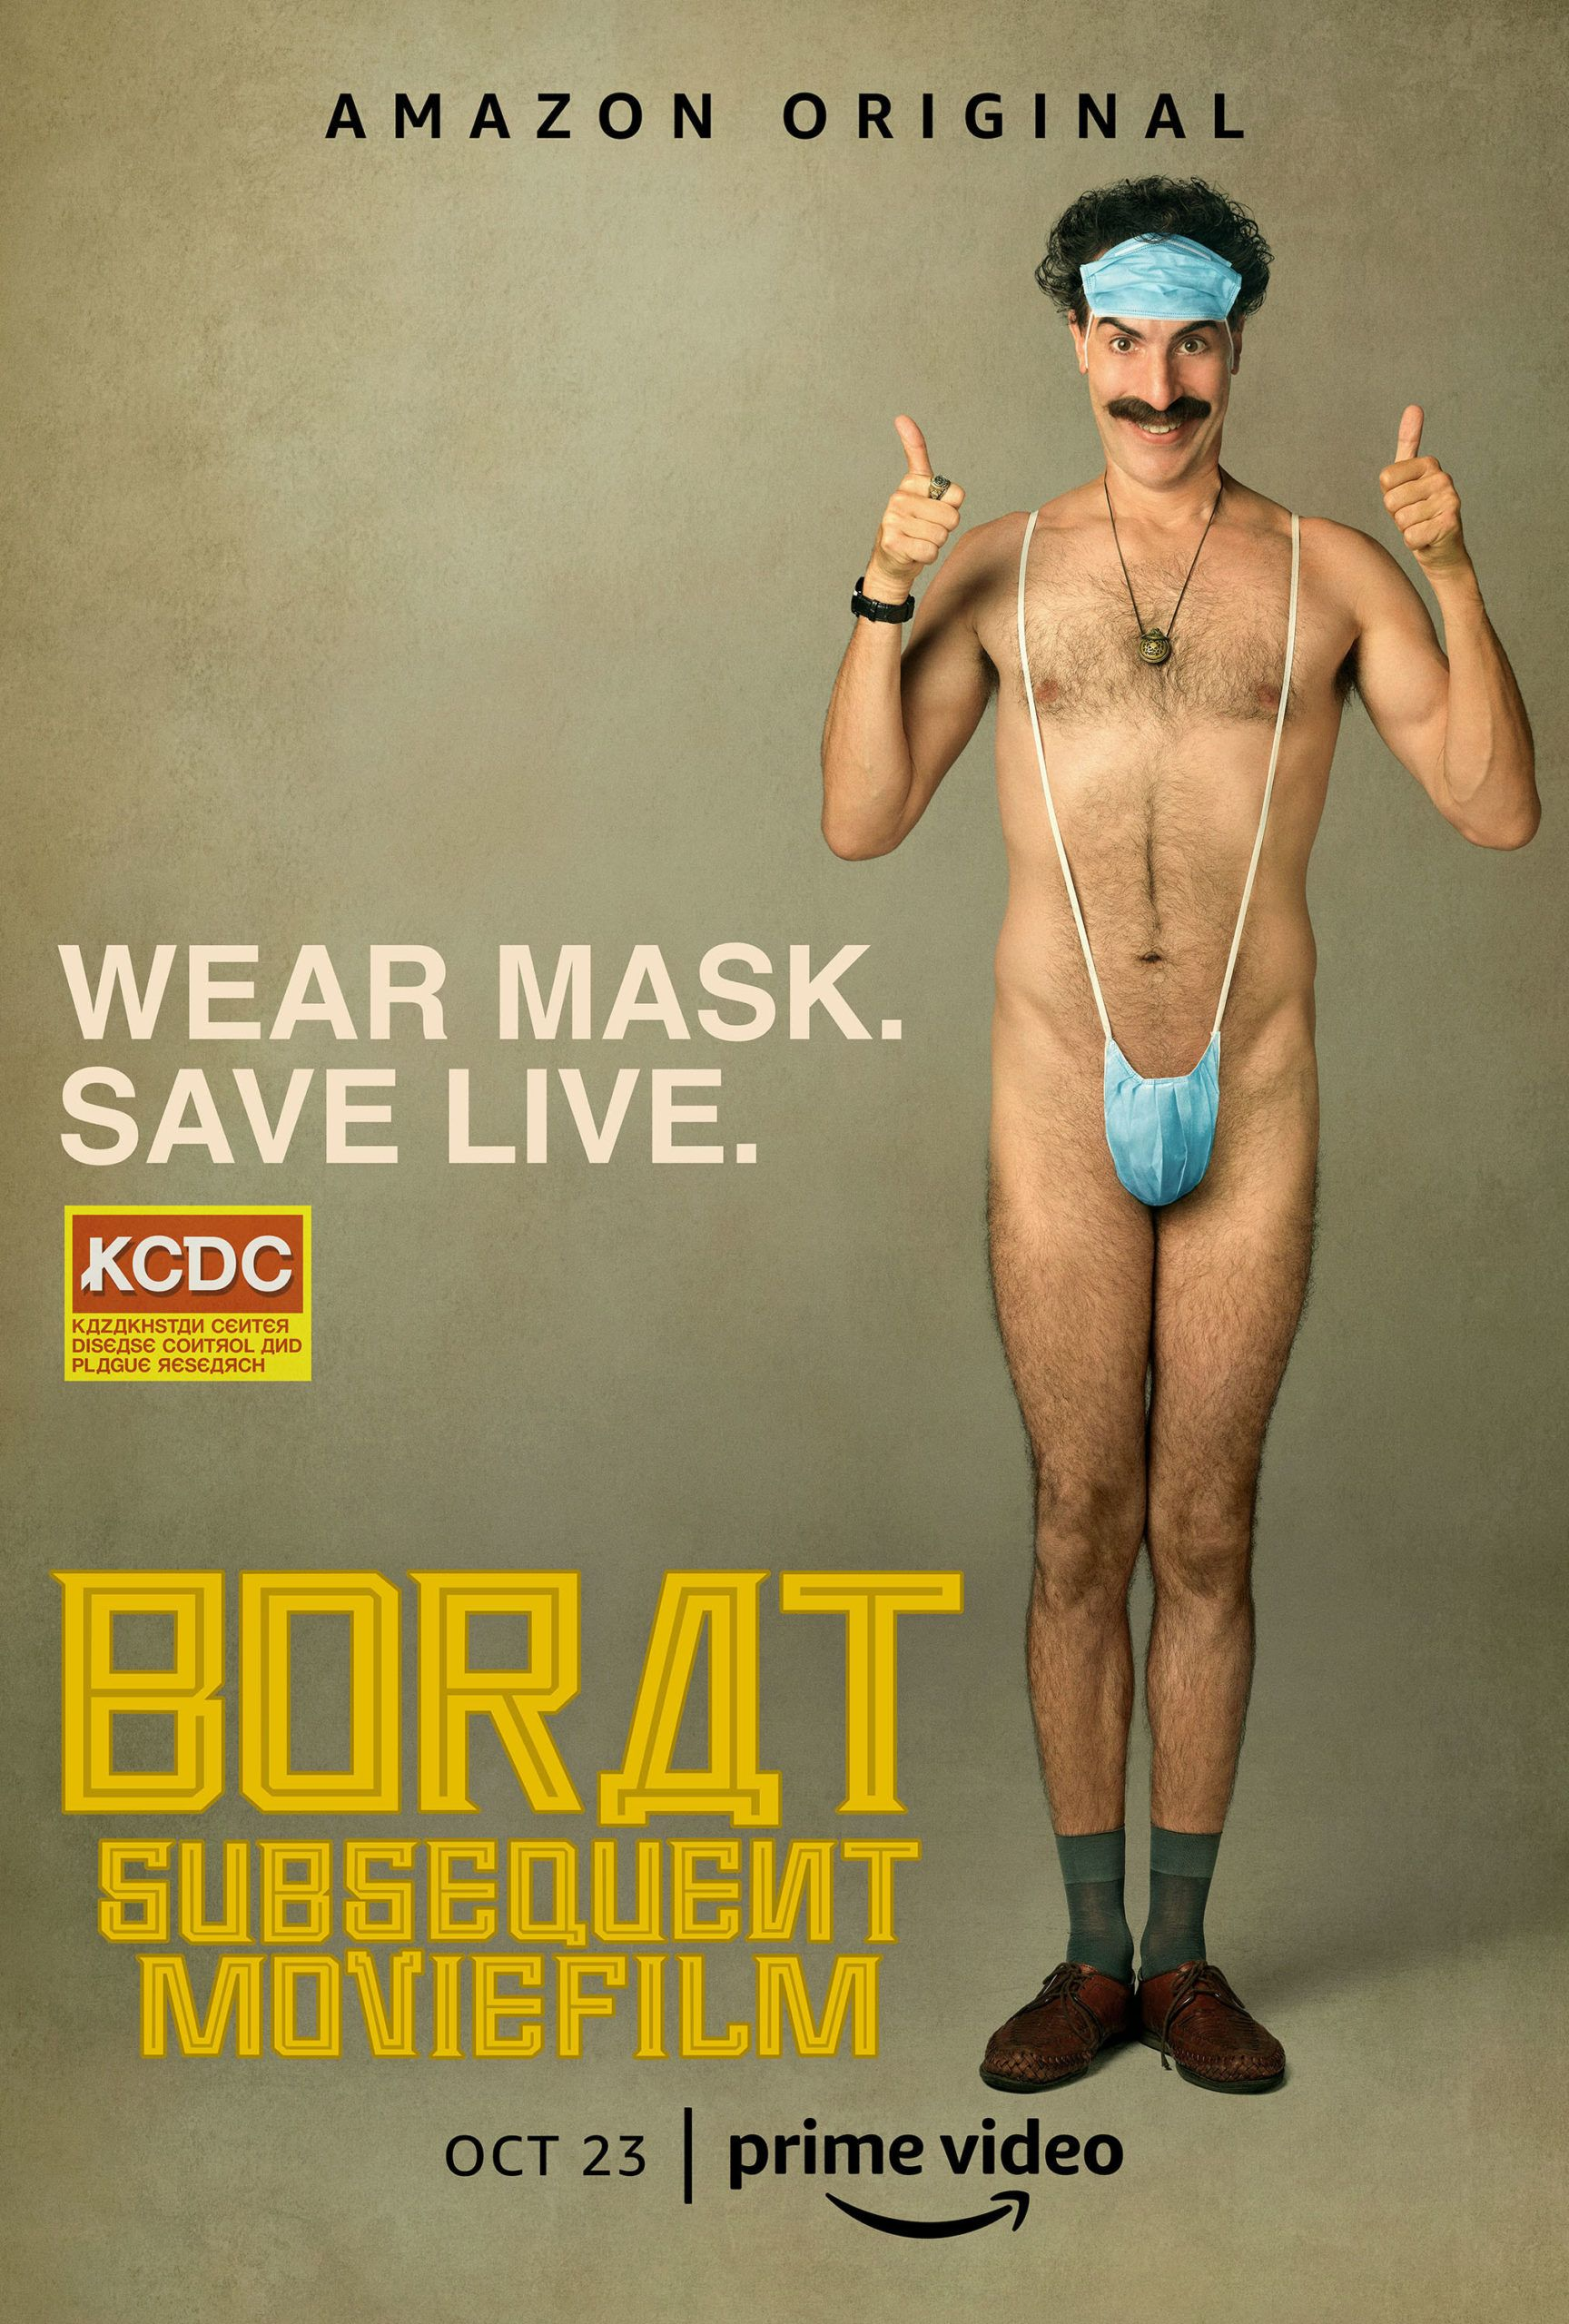 Borat 2 Trailer Reveals the Return of Sacha Baron Cohen's Character |  Collider